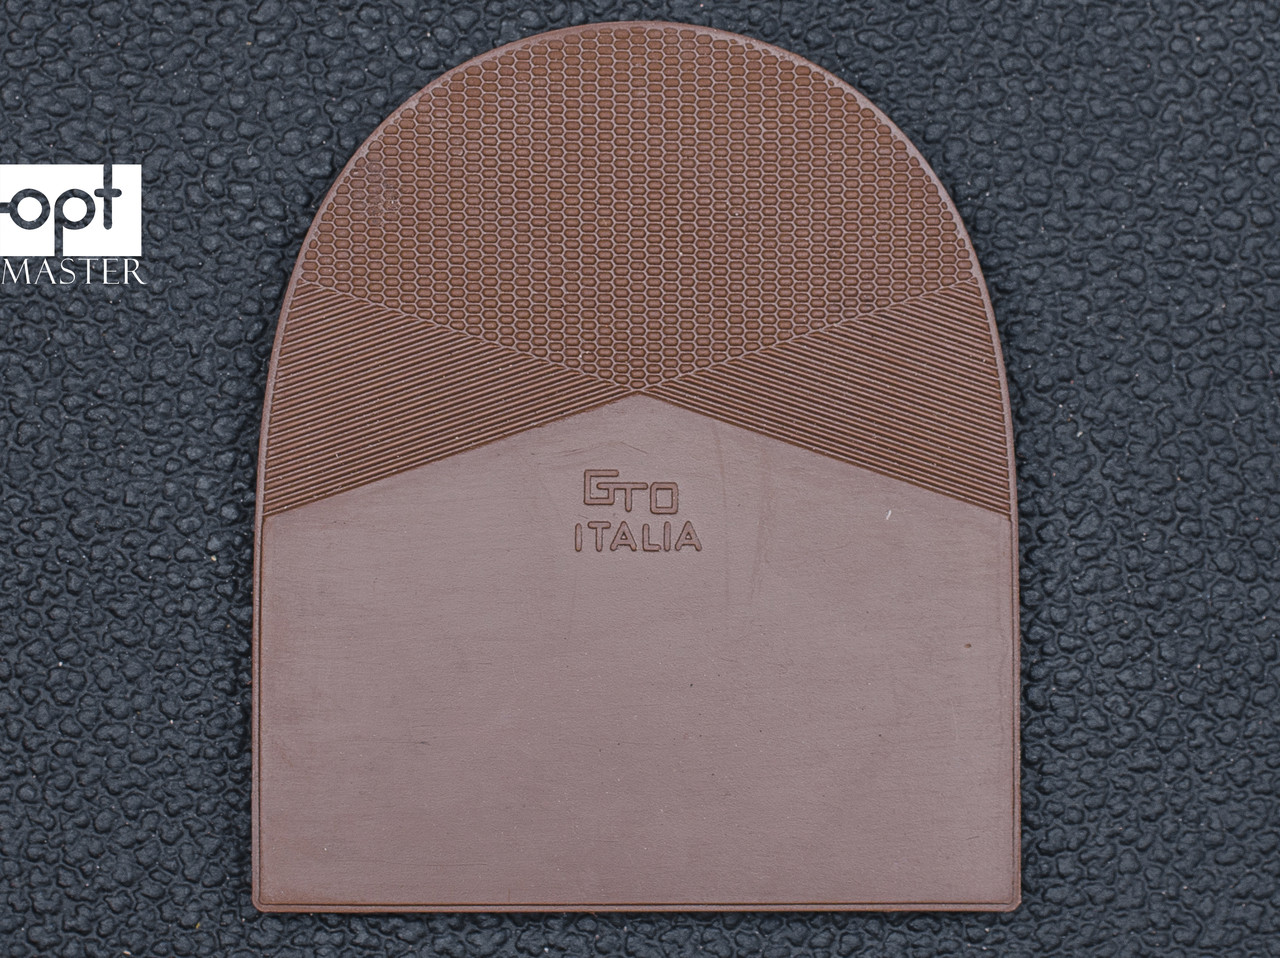 Набойка резиновая мужская GTO Italia (Китай), т. 6.6 мм, р.13-14, цв. тропик (св. коричн)